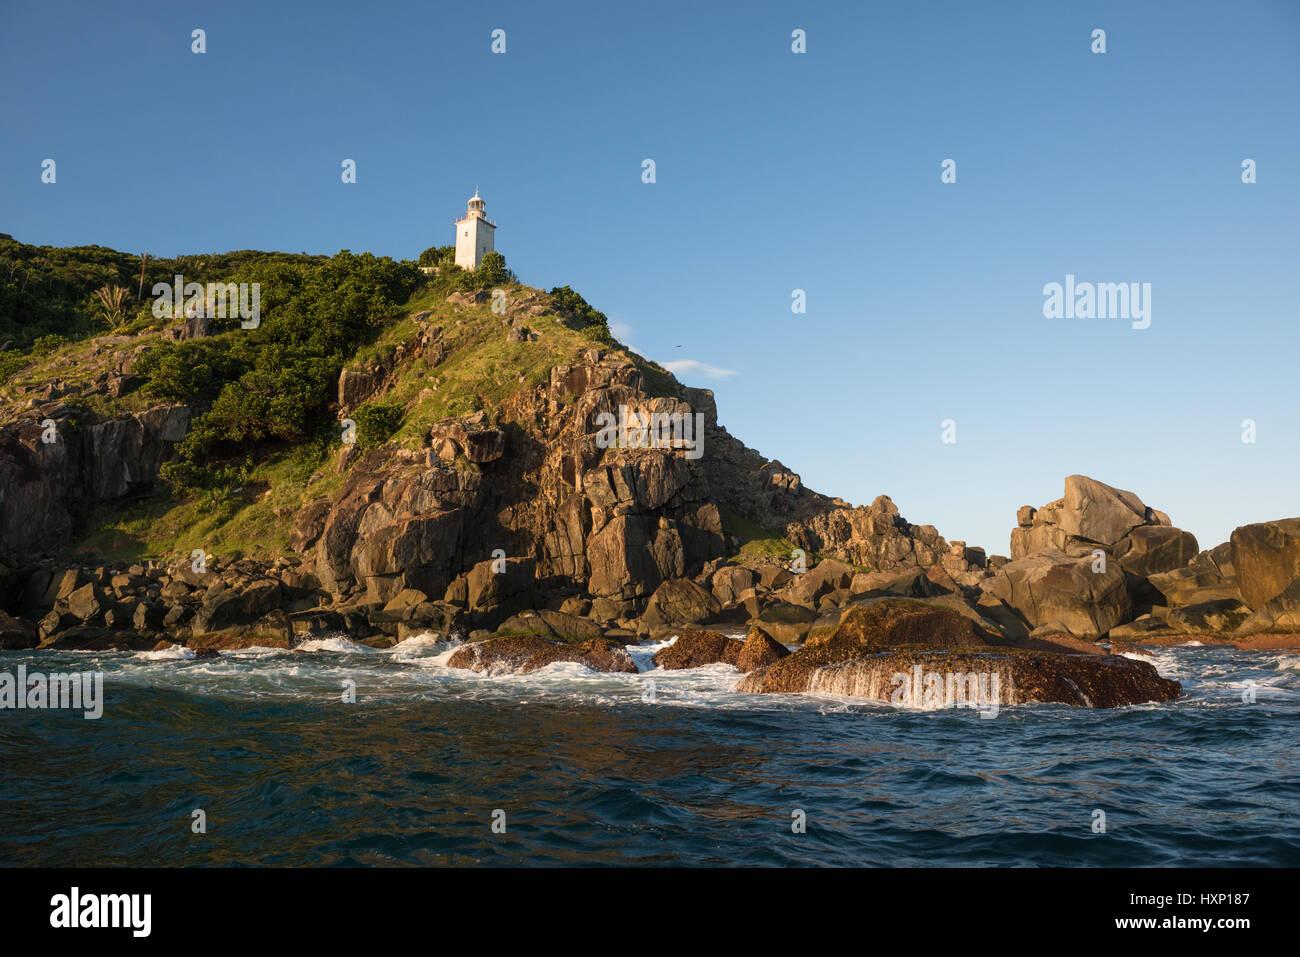 Ponta do Boi lighthouse in Ilhabela Stock Photo